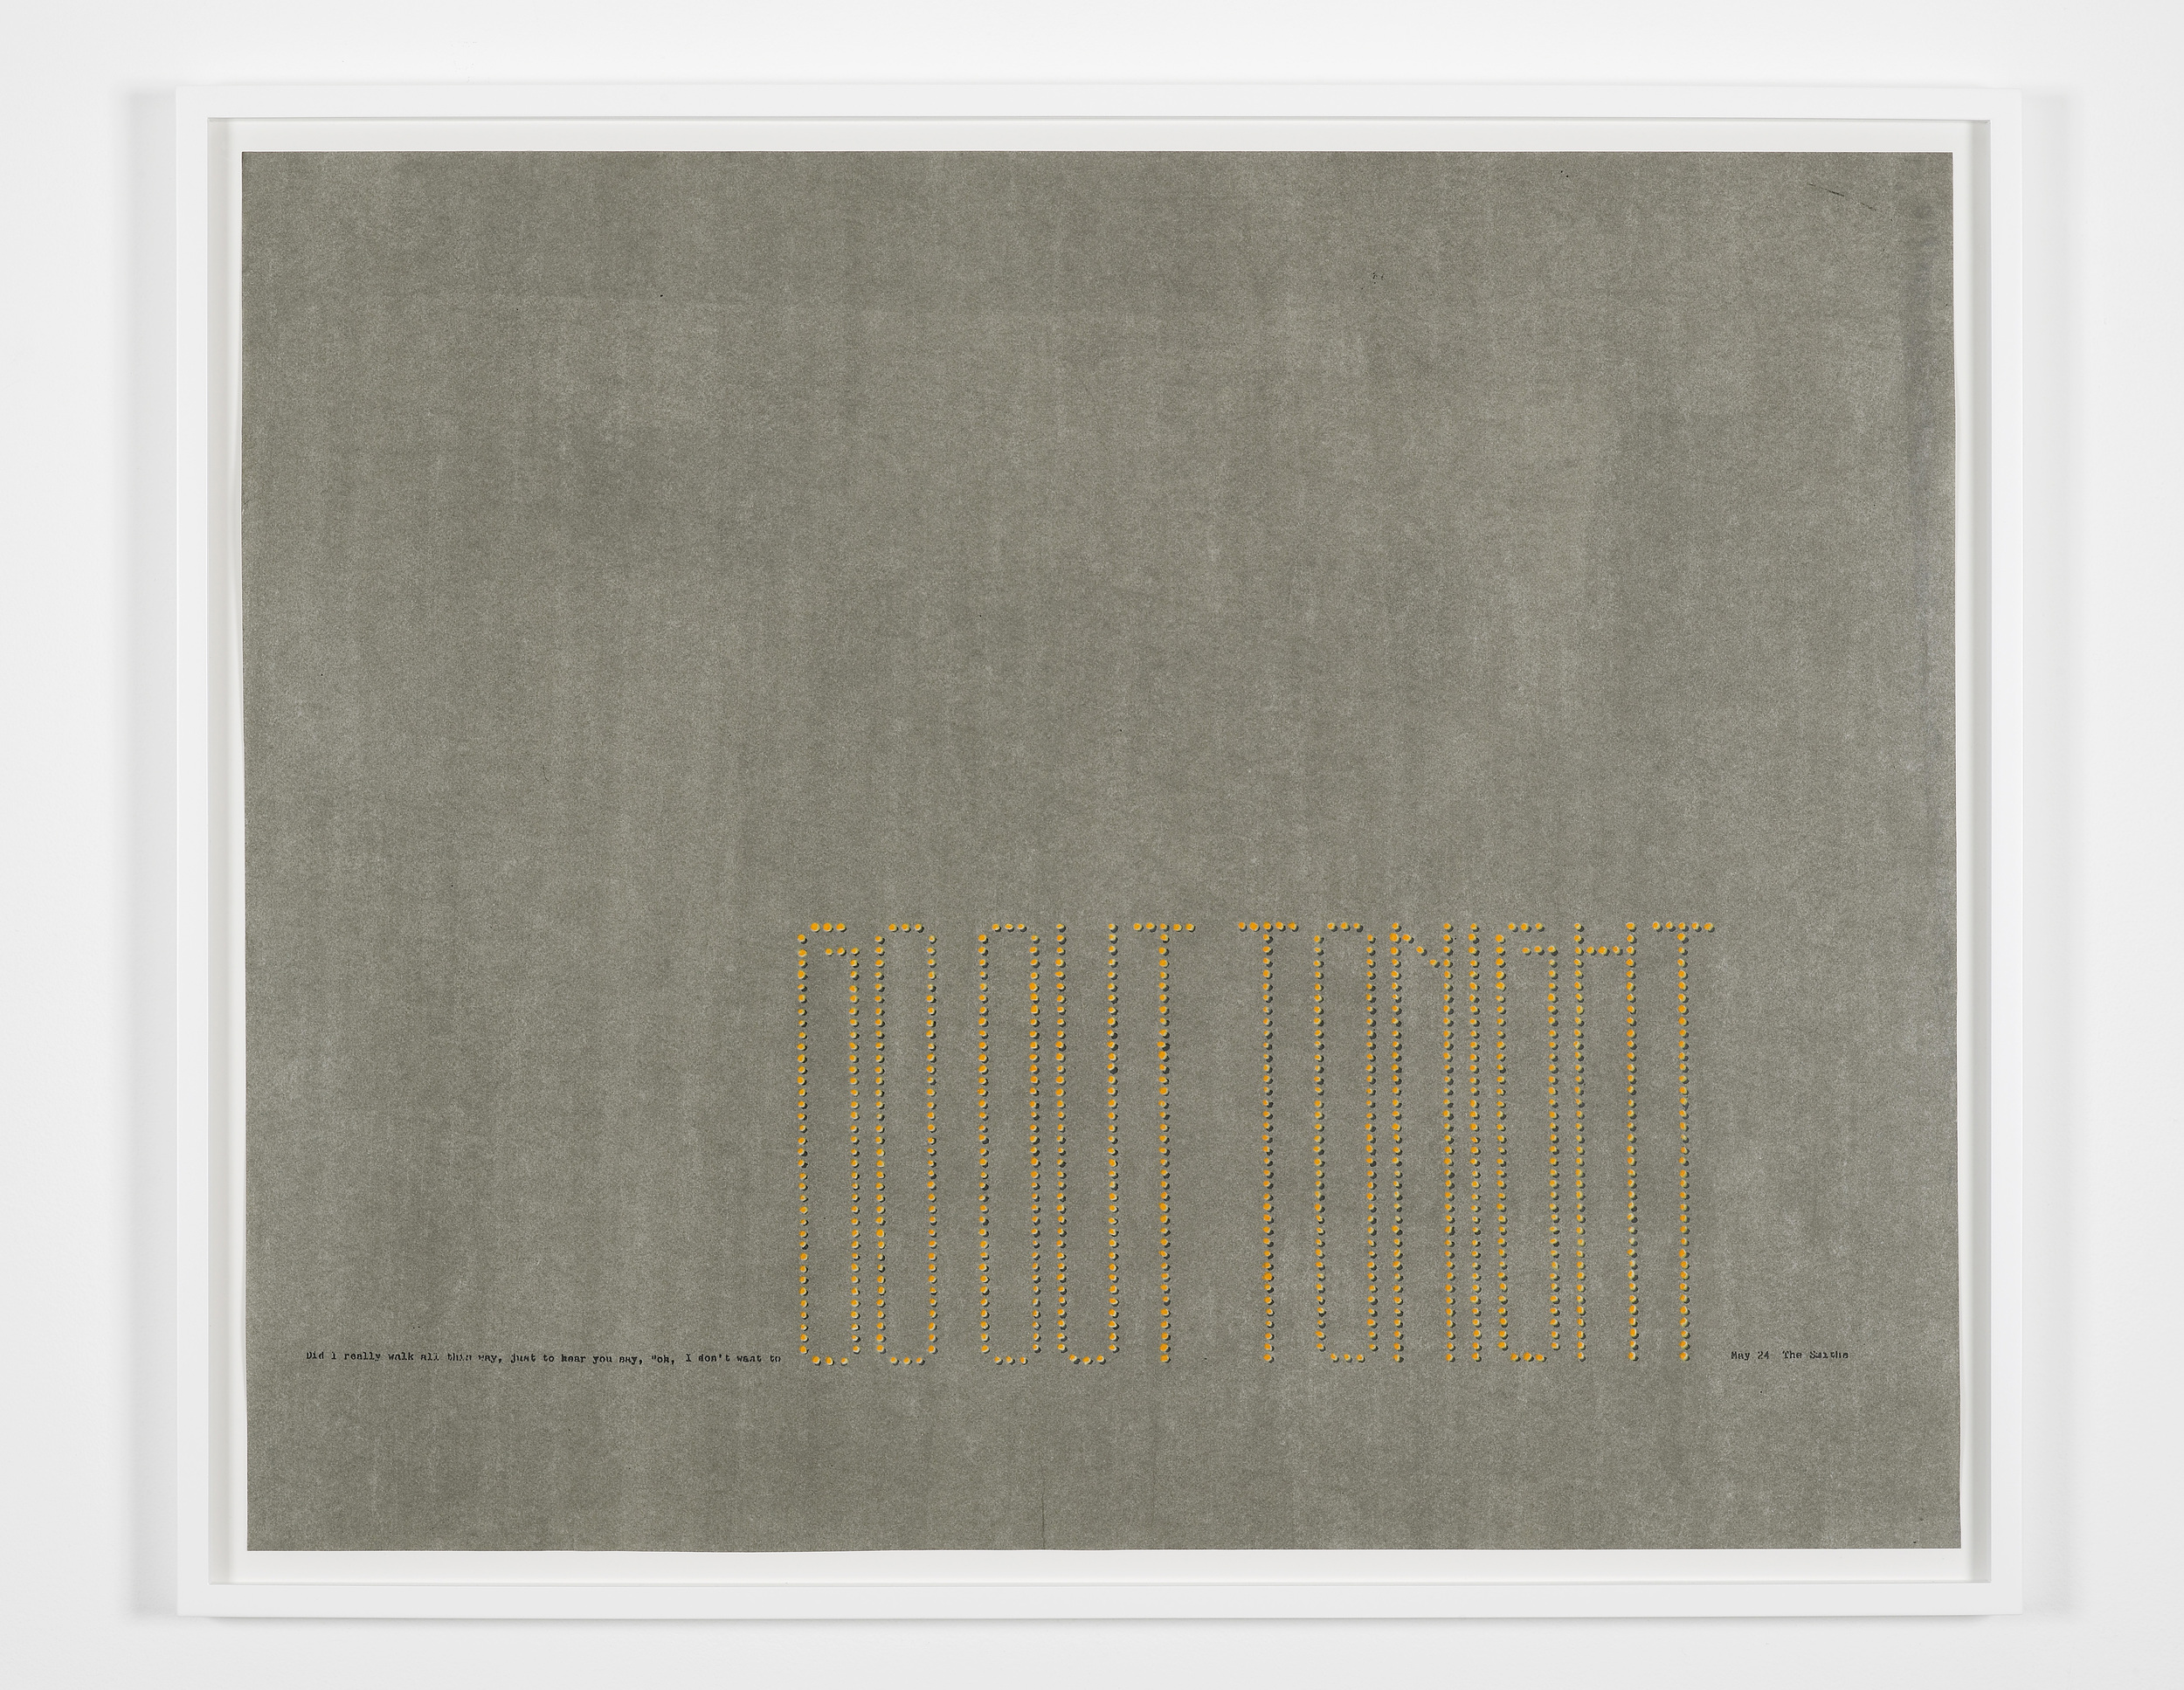 Marc Hundley Did I really walk all this way 2012 Ink, enamel, polyurethane on paper 73.8 x 90 cm / 29 x 35.4 in